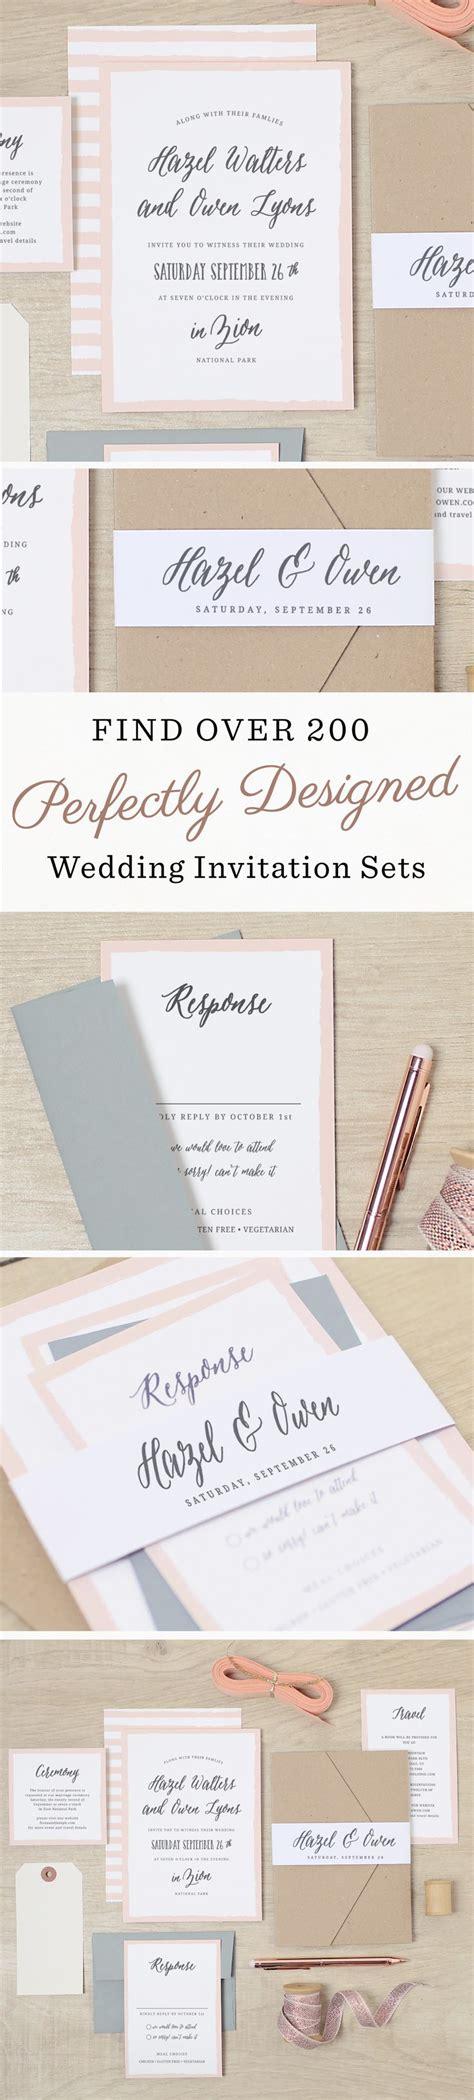 wedding invitations size 17 best images about wedding invitations on standard envelope sizes gold wedding